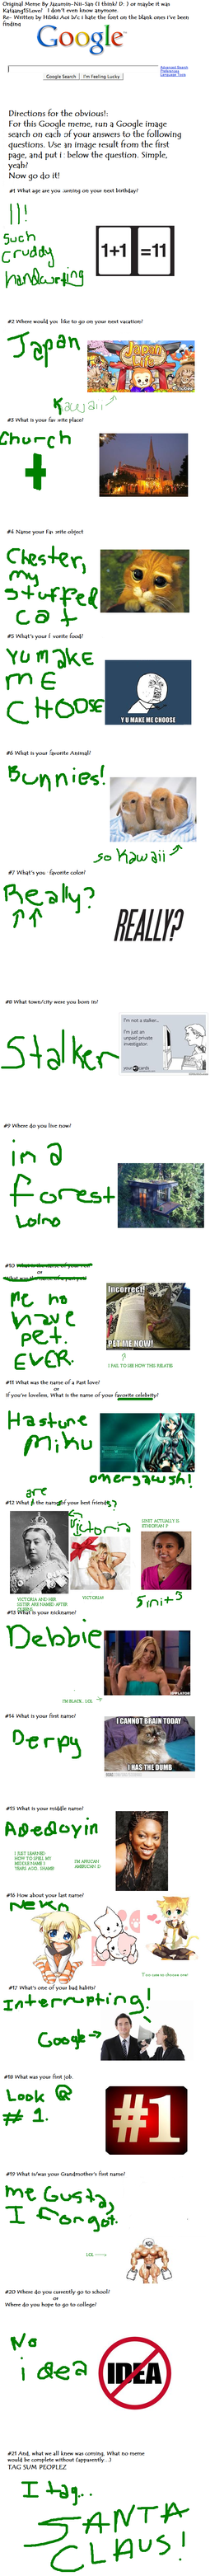 Google Meme :D by DerpysGalleria